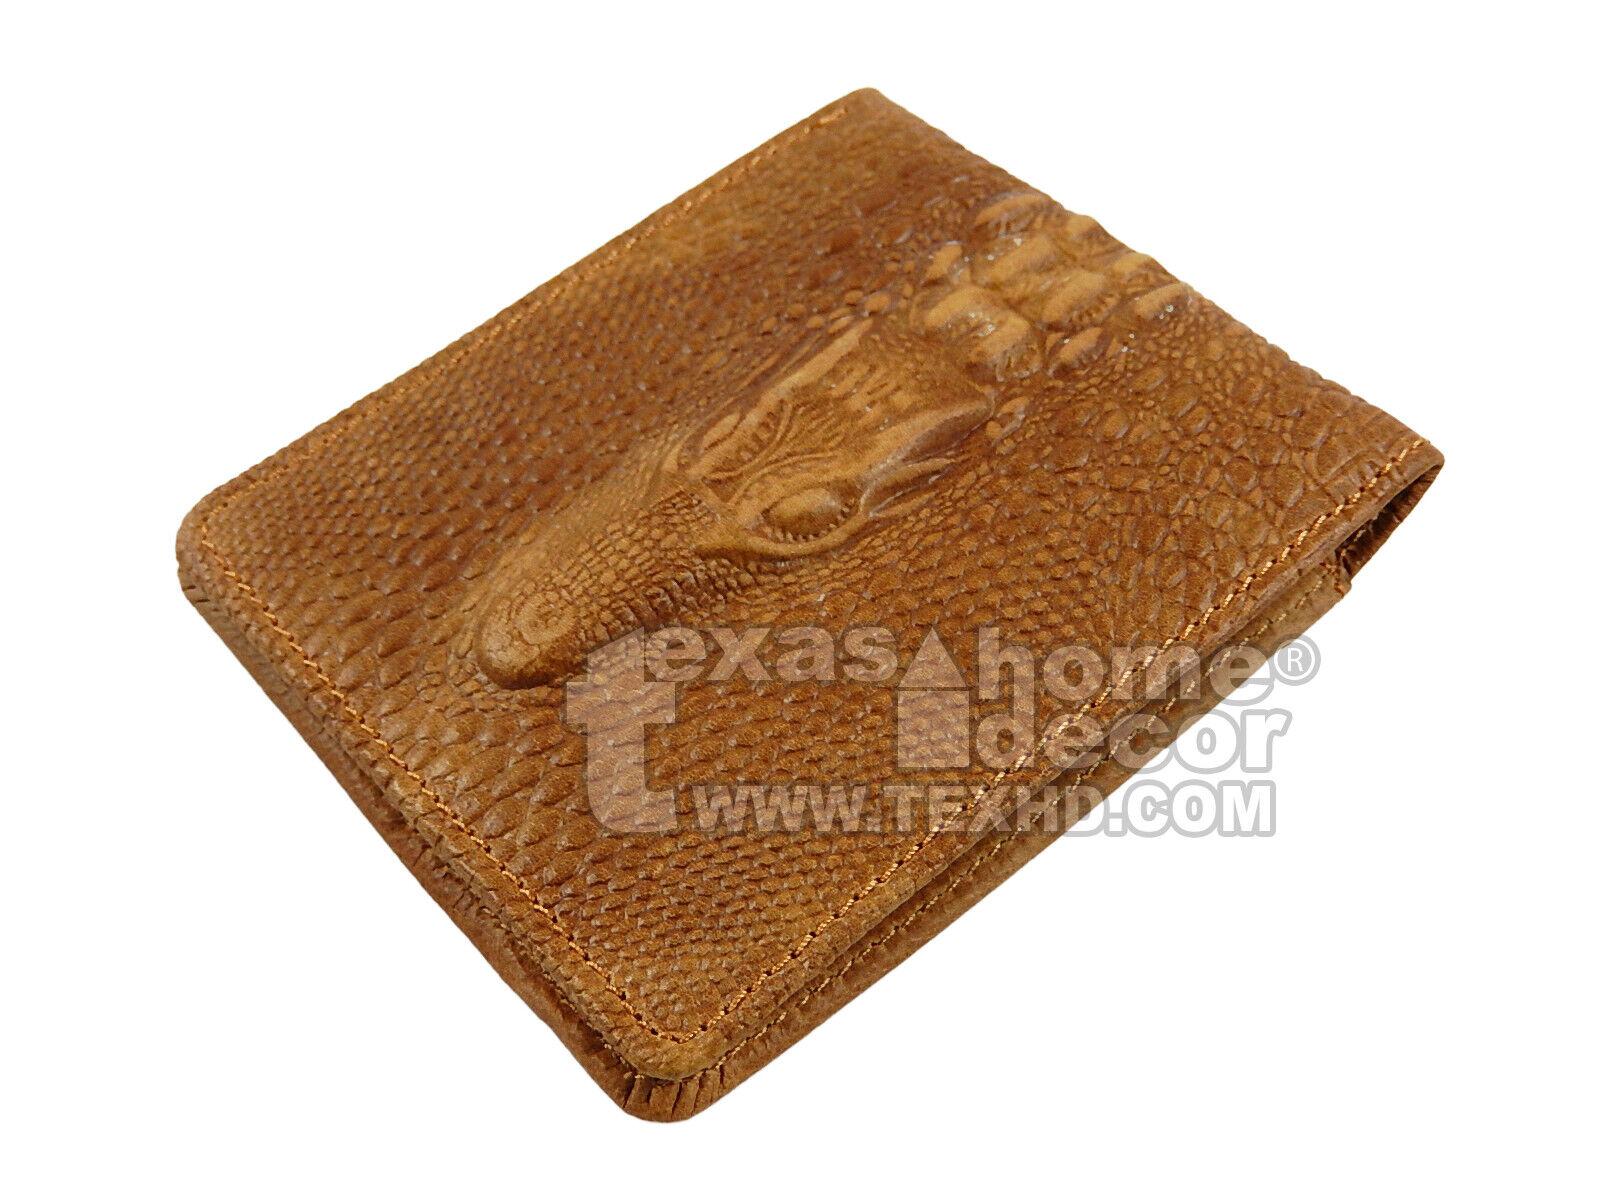 Western Bi-Fold Men's Wallet Genuine Hand Tooled Leather Crocodile Texture Brown